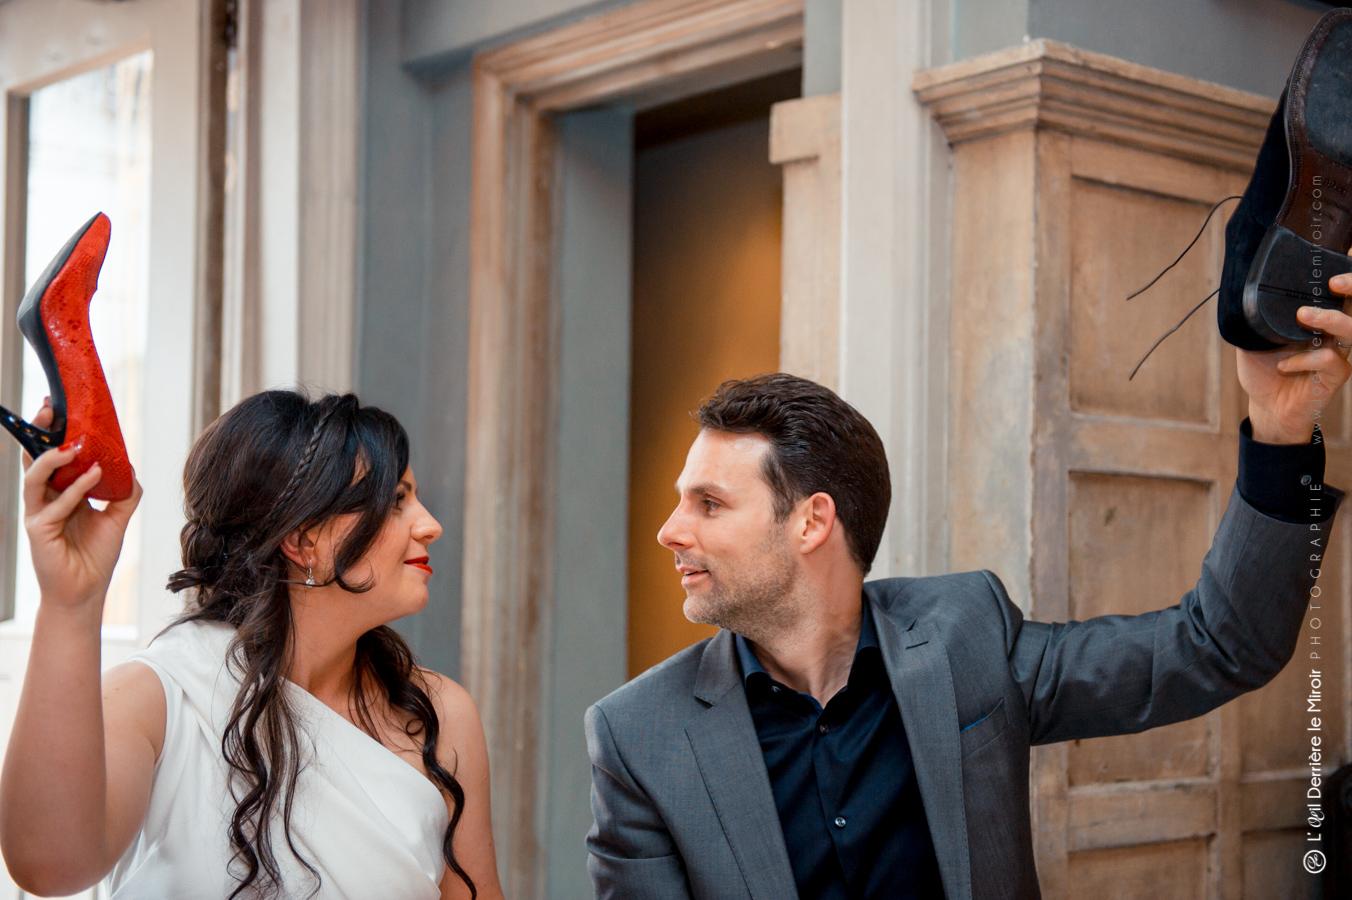 Destination-wedding-photographer-london-AG-061